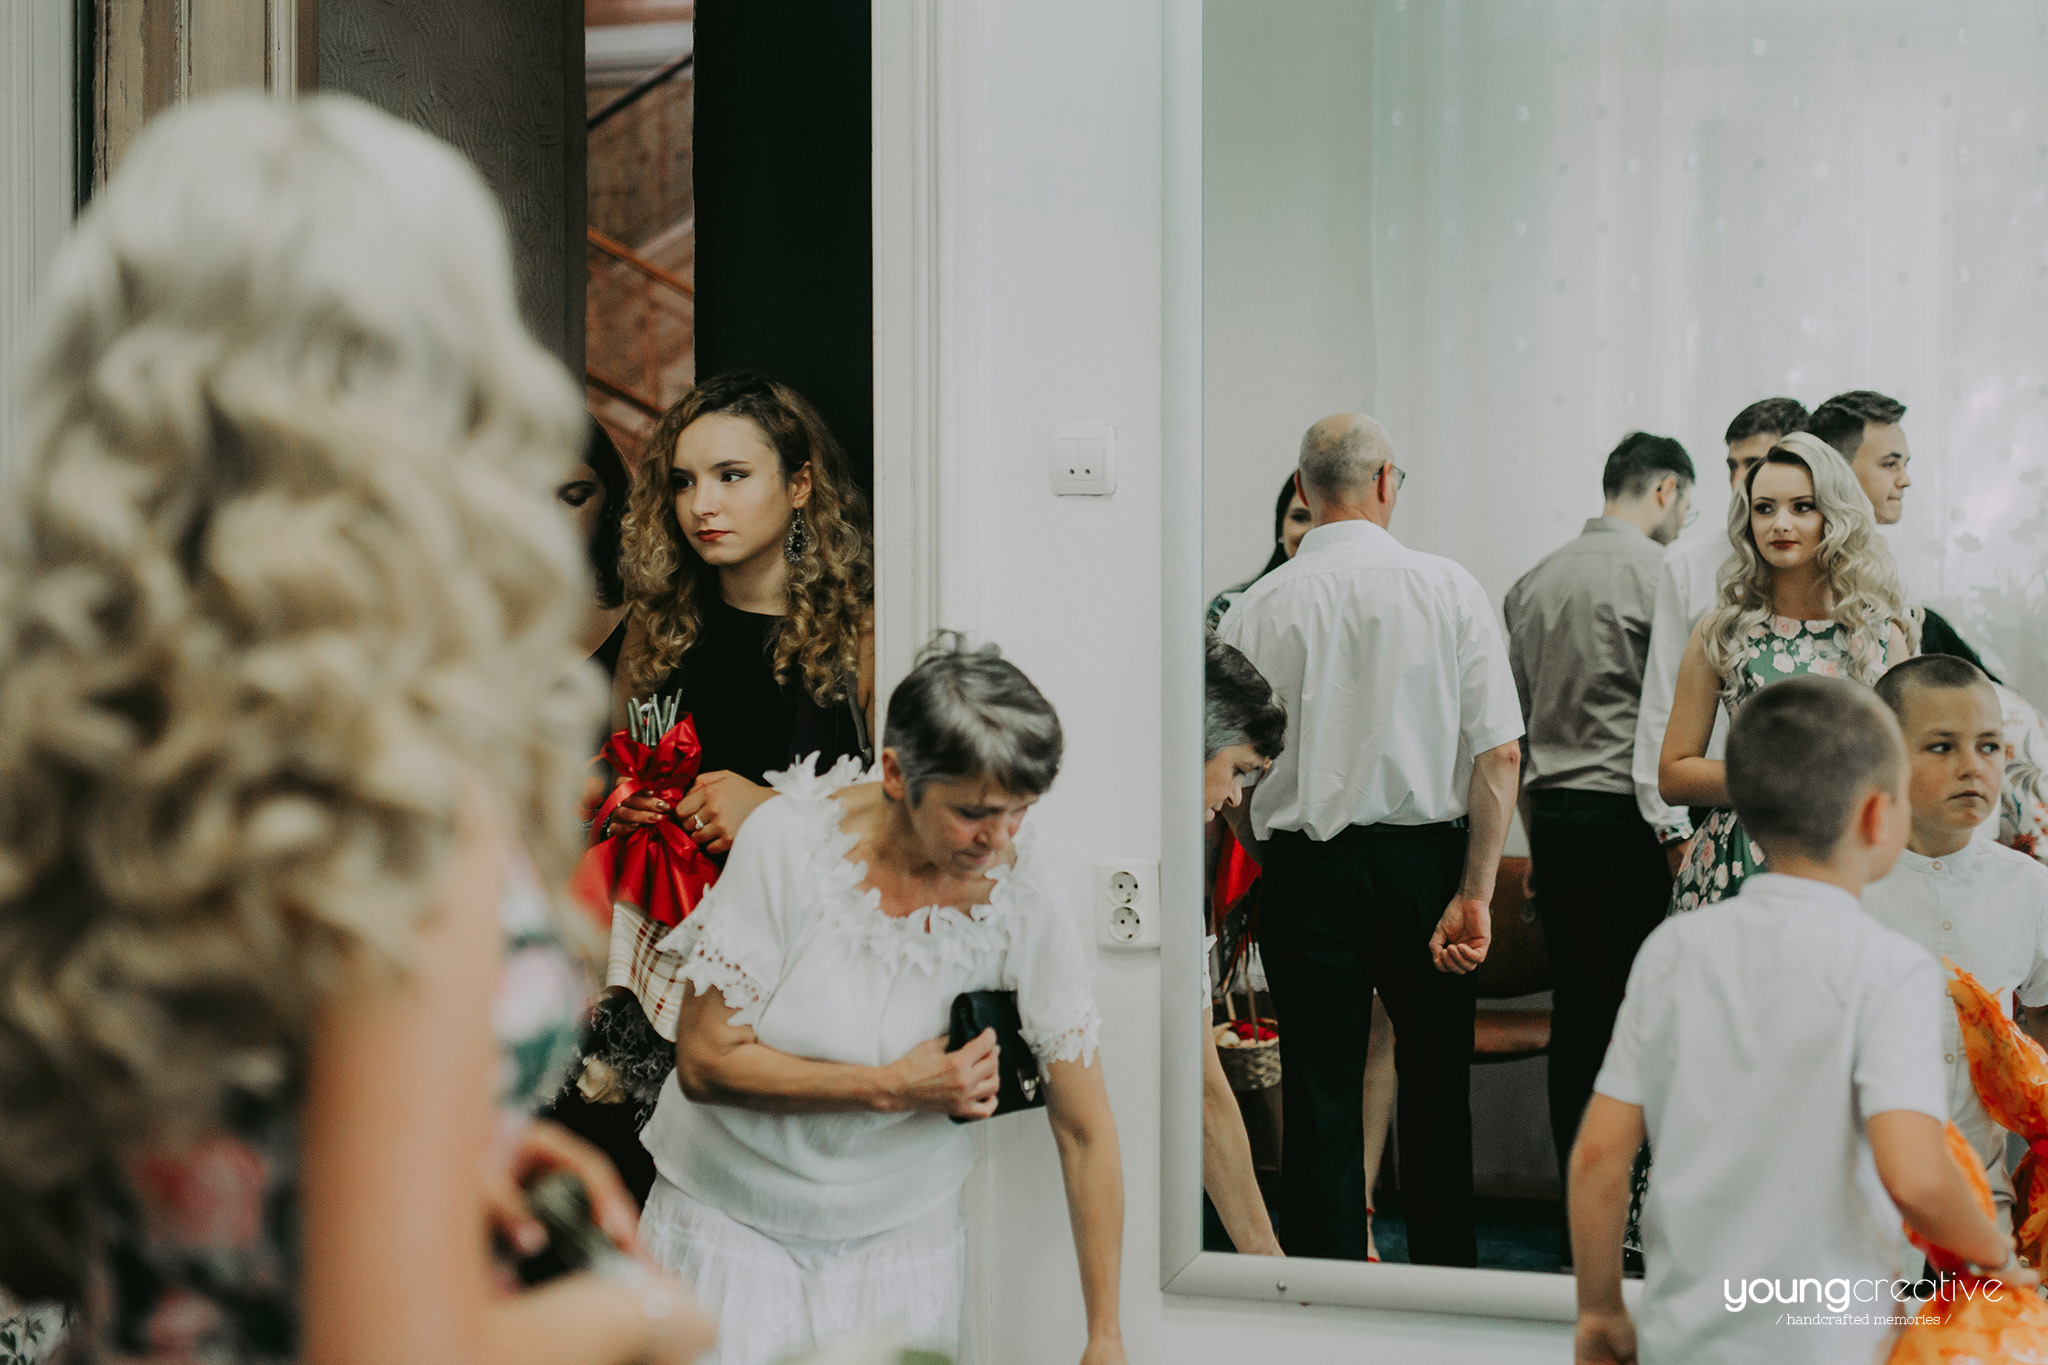 Larisa & Laurentiu | youngcreative.info media © Dan Filipciuc, Cristina Bejan | fotografie de nunta Iasi